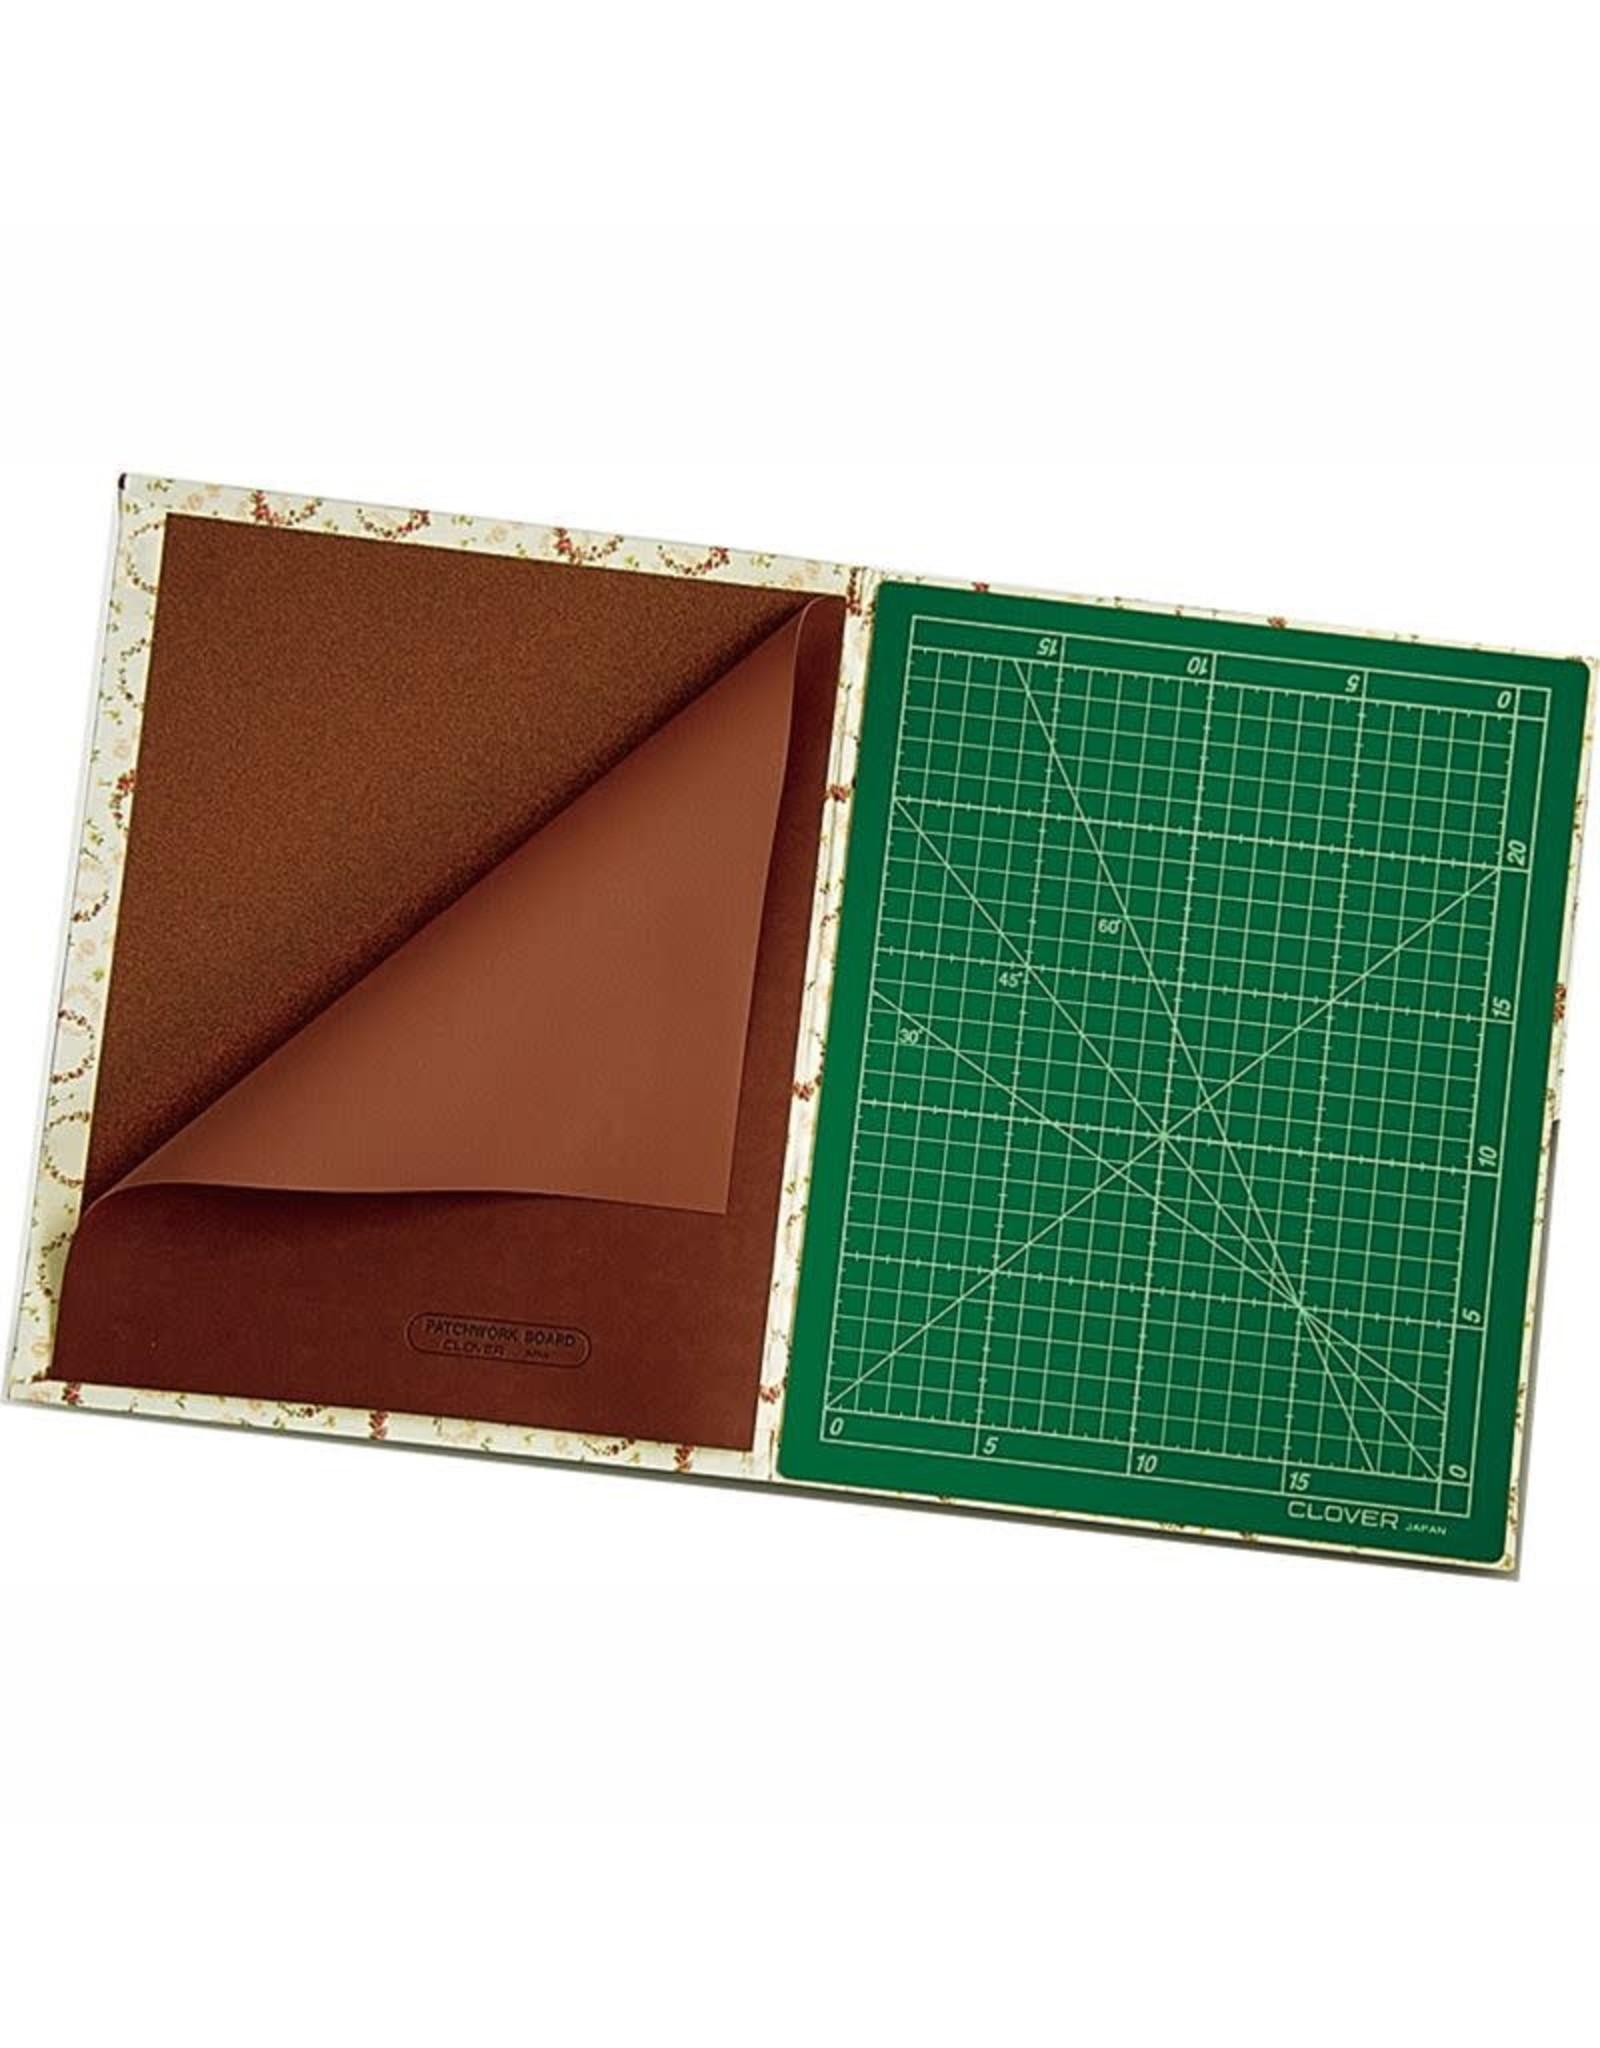 Clover Patchwork Board Multi